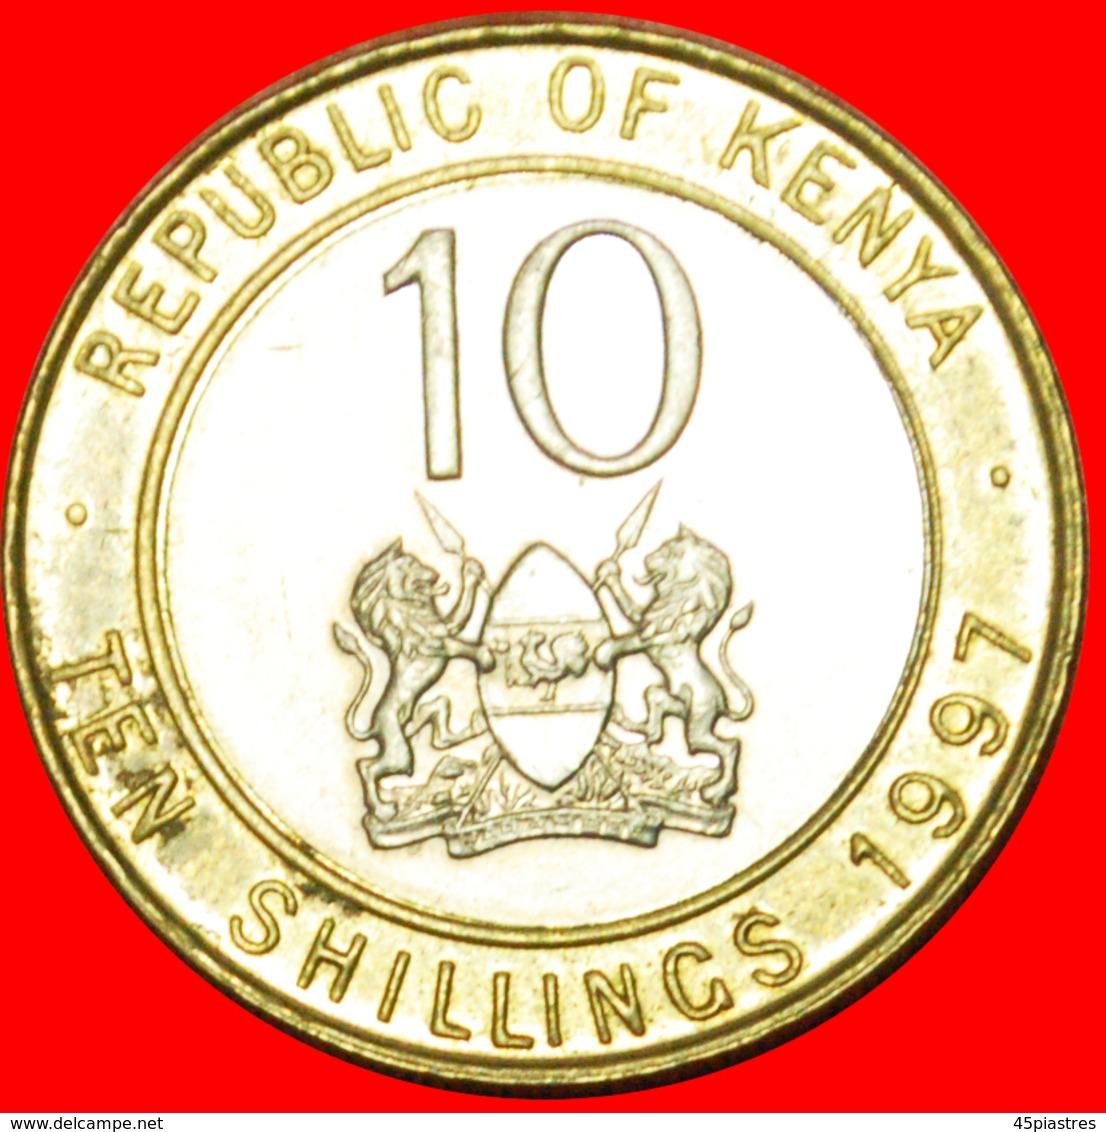 # COCK AND LIONS (1994-1997): KENYA ★ 10 SHILLINGS 1997 MINT LUSTER! LOW START ★ NO RESERVE! - Kenya